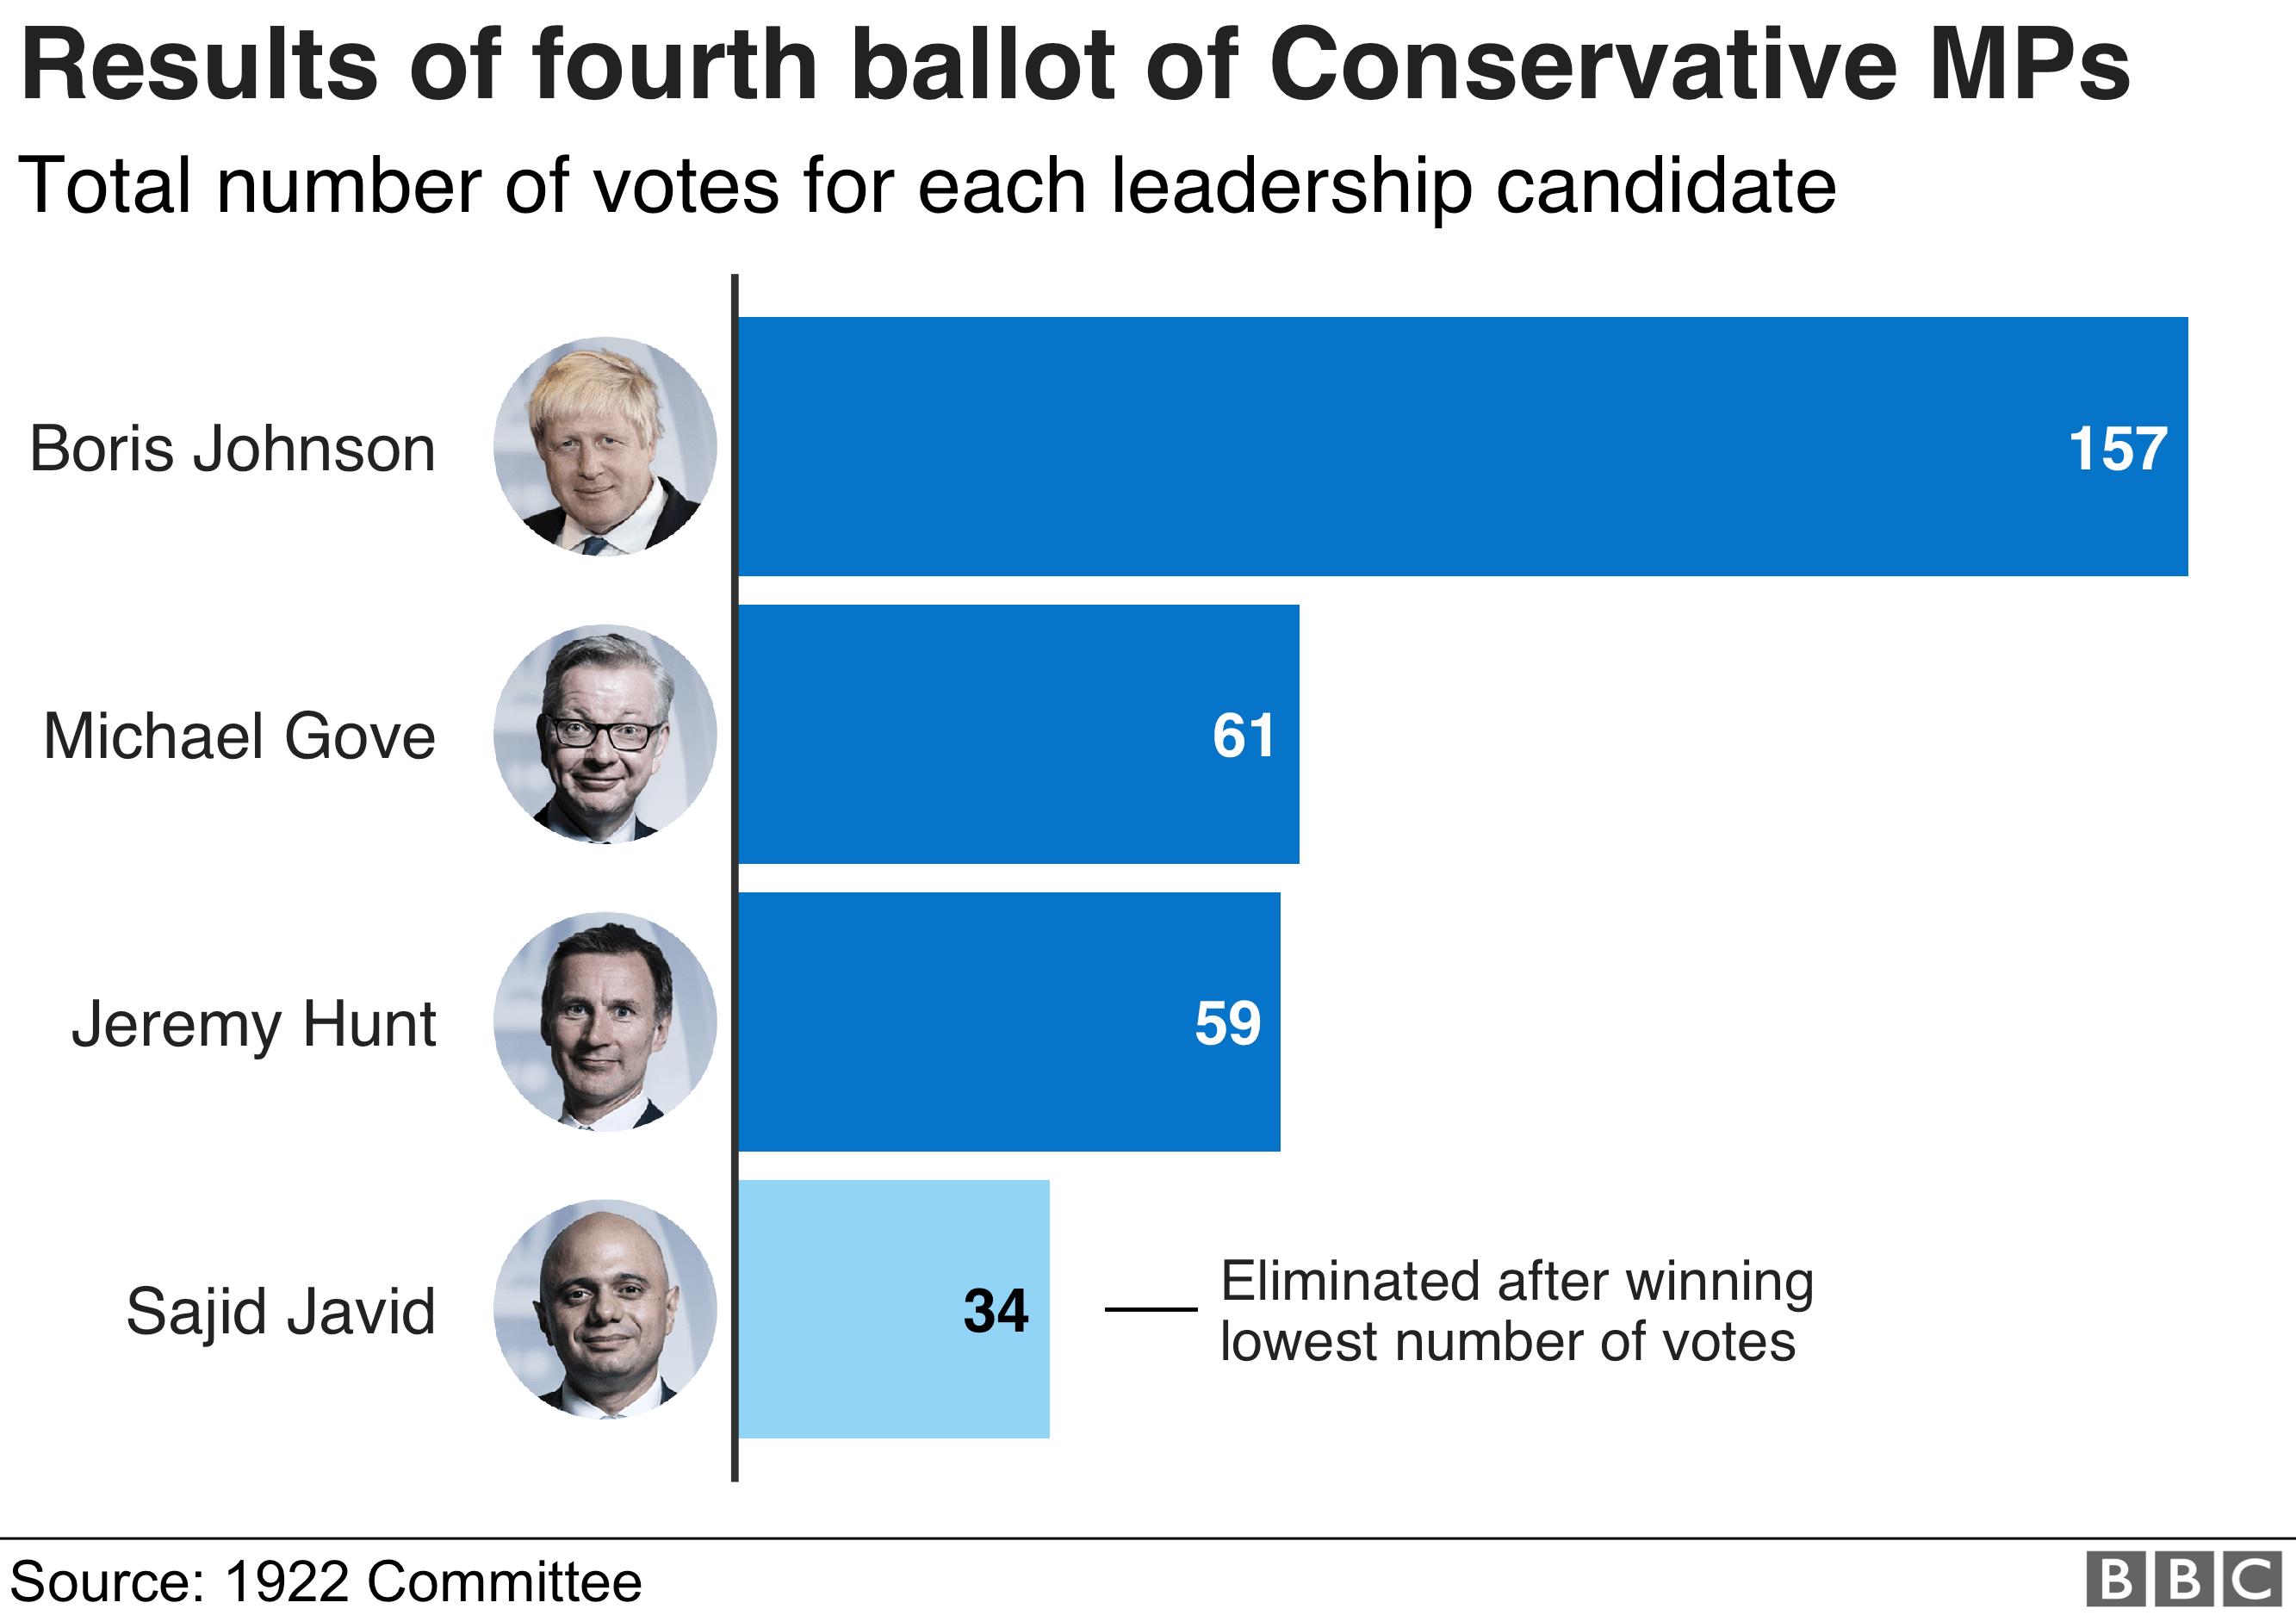 Tory leadership: Sajid Javid knocked out of contest